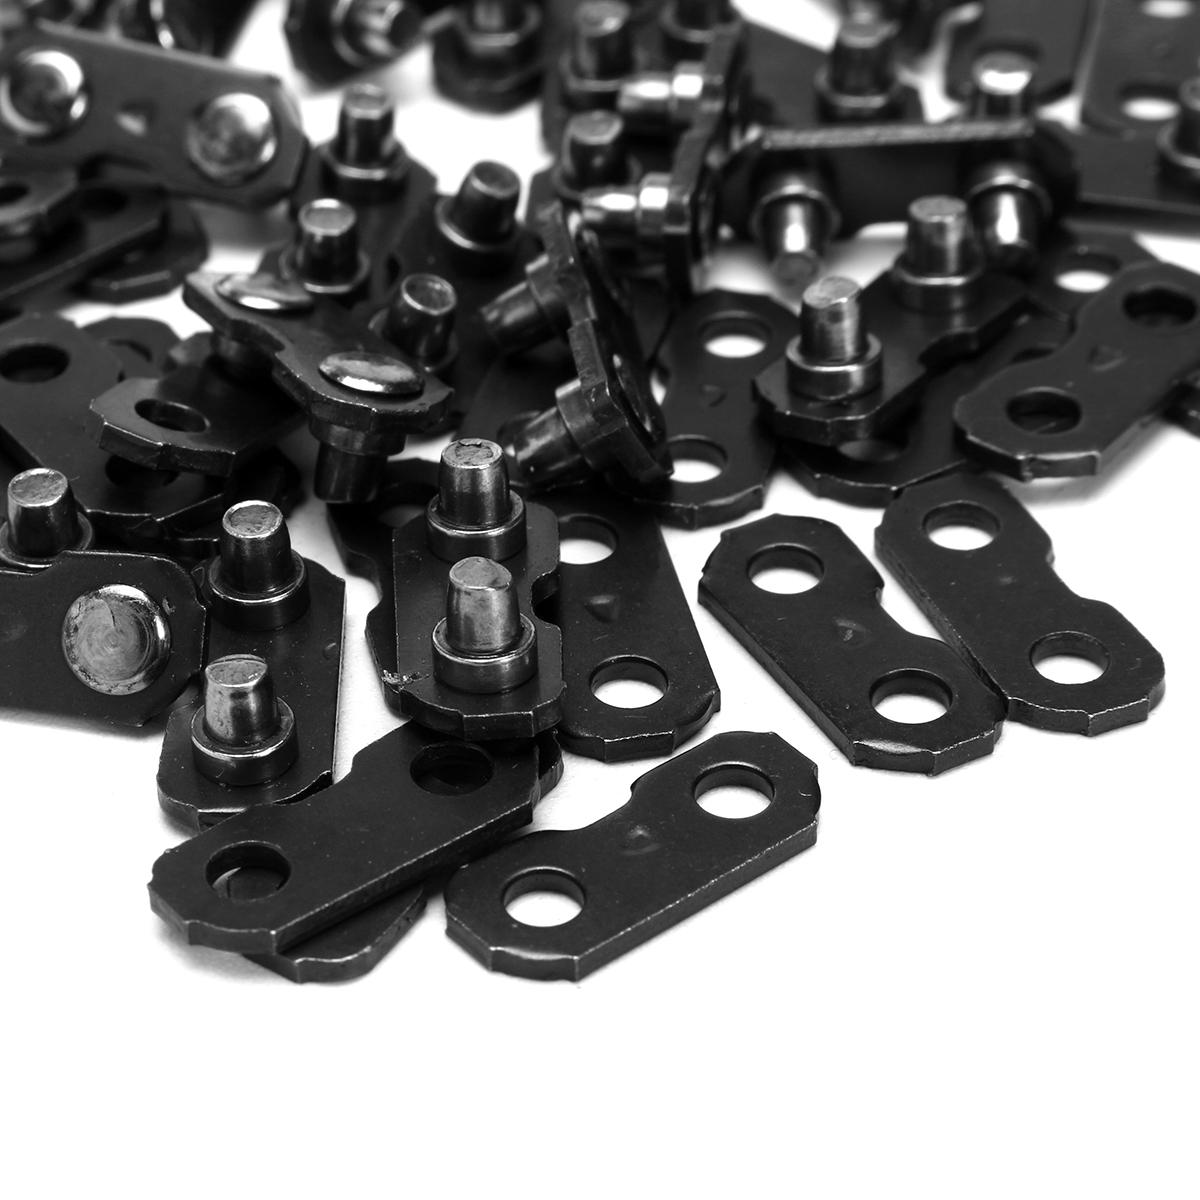 24pcs 3/8 Inch Chainsaw Chain Link Connectors F Oregon Type Repair Preset Straps